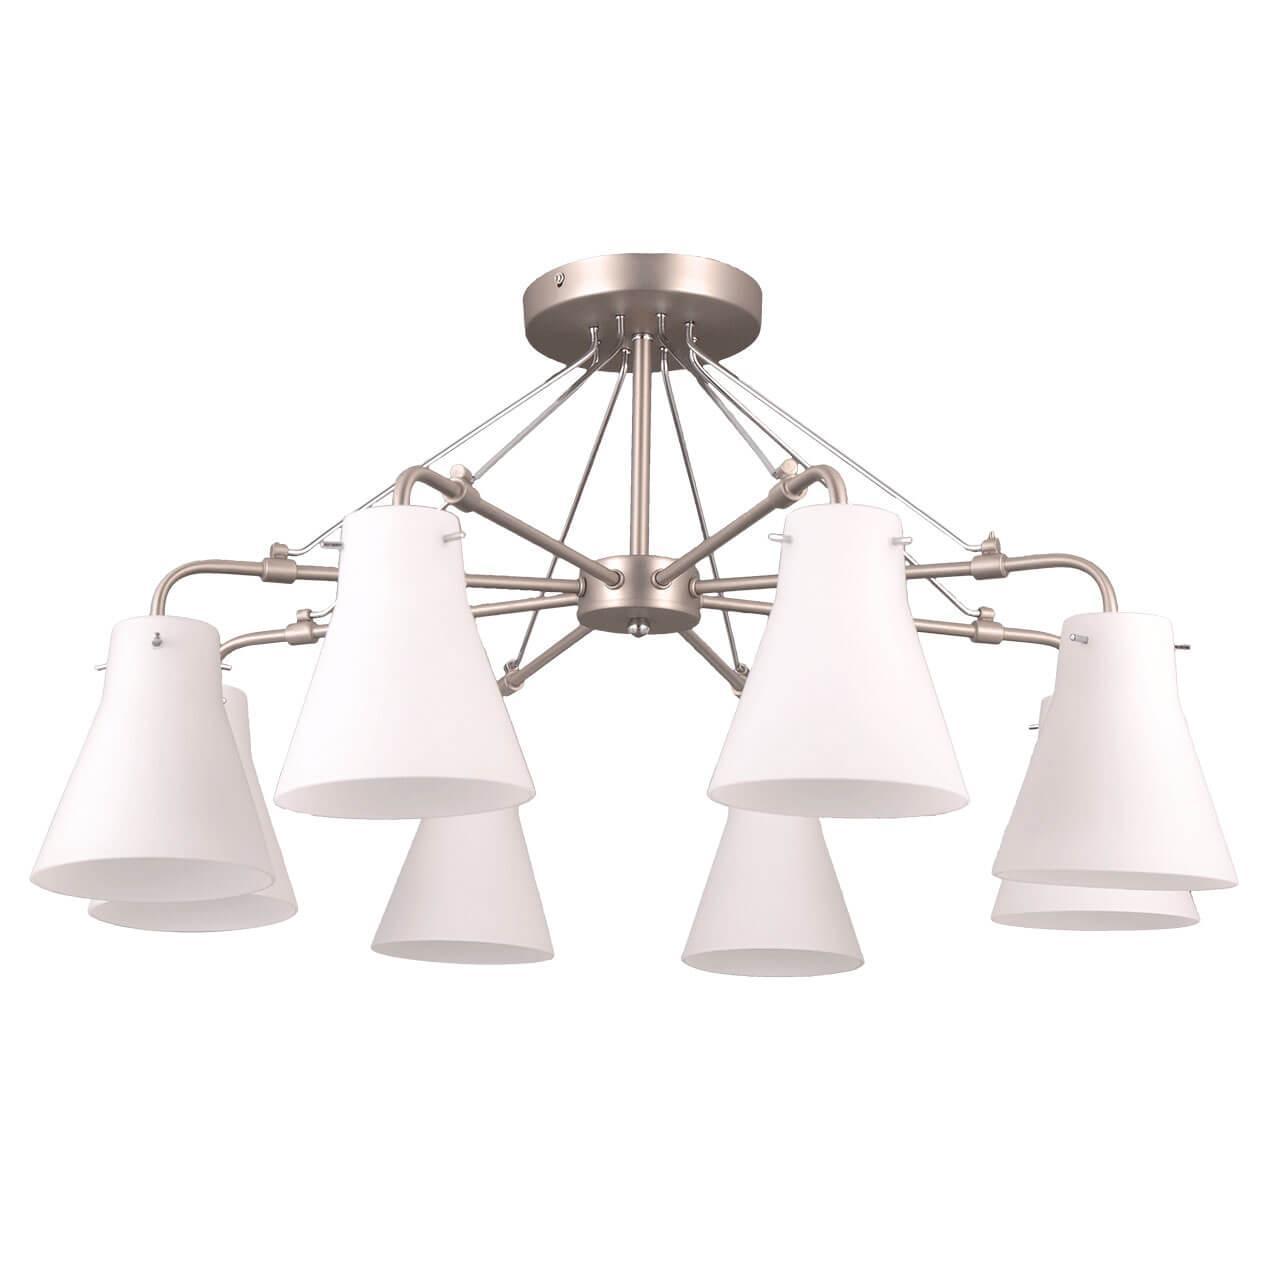 Люстра Vele Luce Fedele VL1365L08 потолочная потолочная люстра vele luce fedele vl1365l08